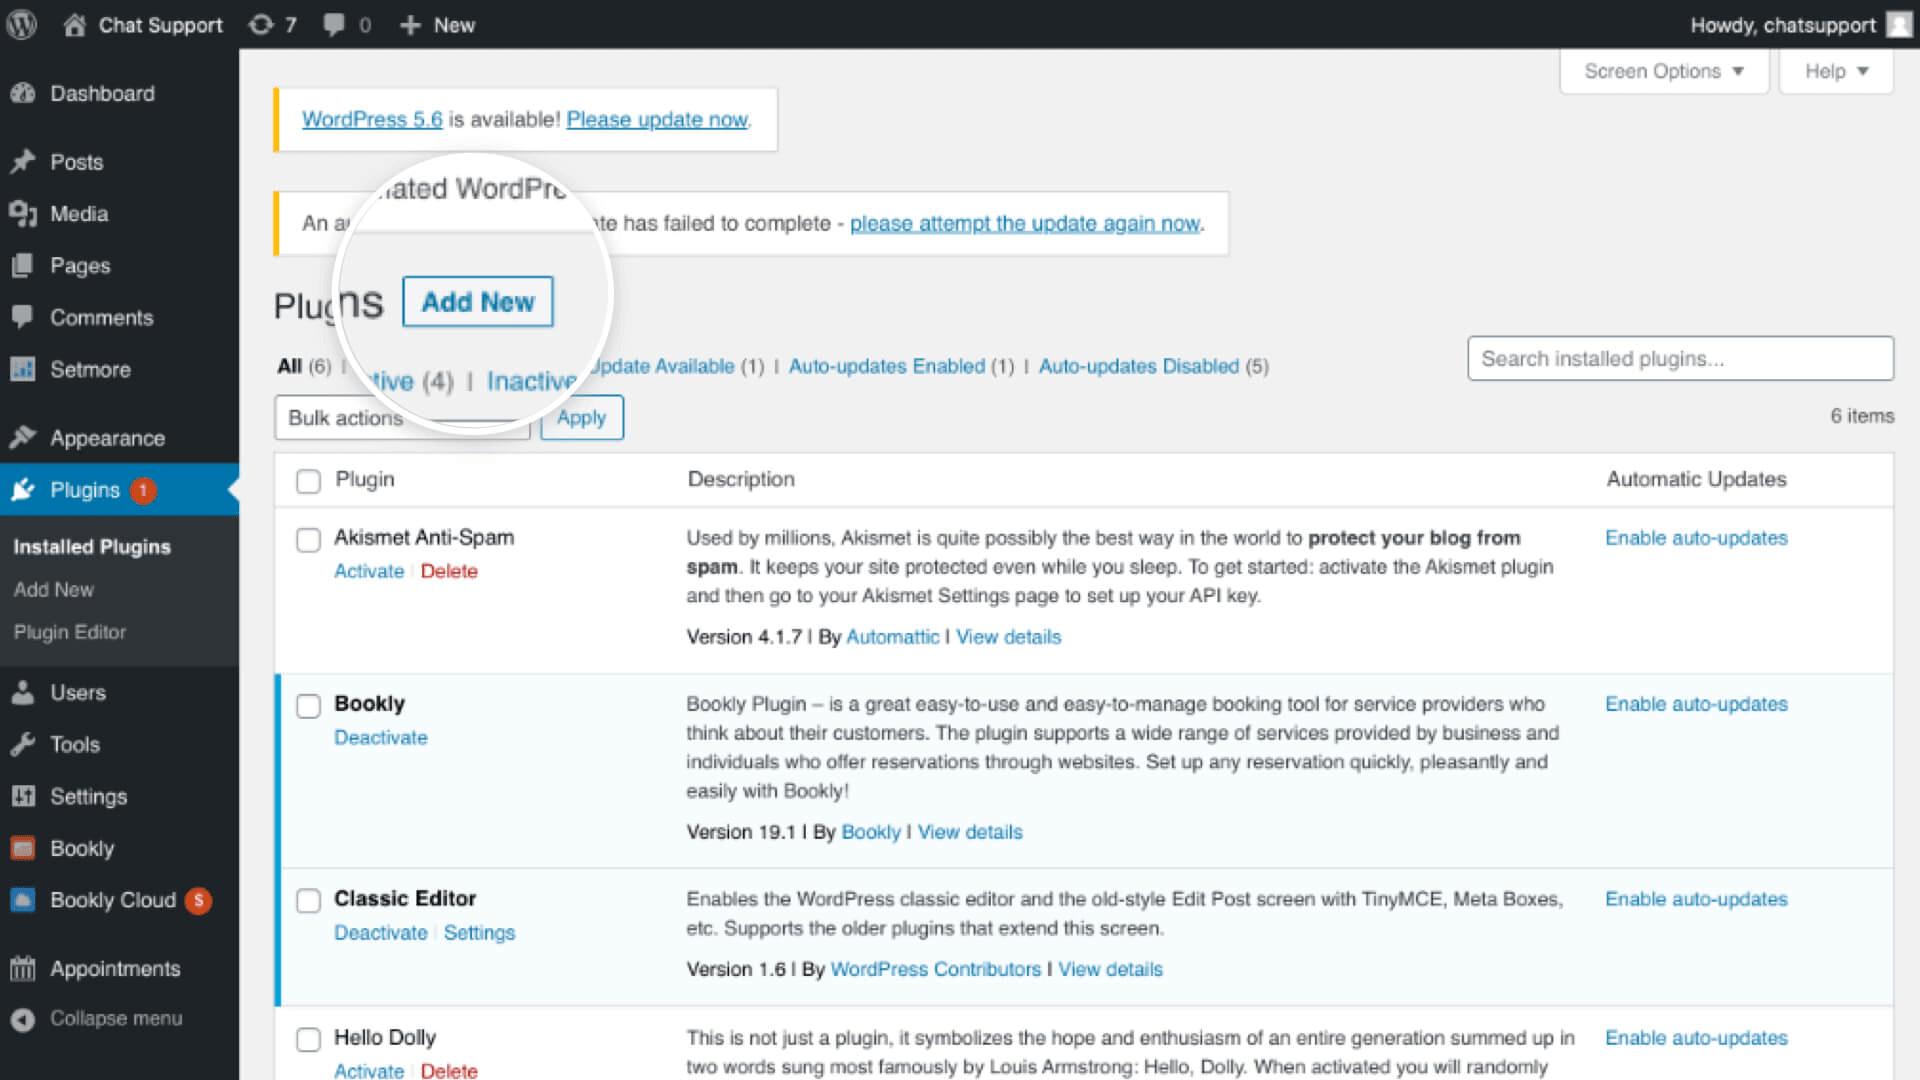 The Wordpress plugins tab showing options